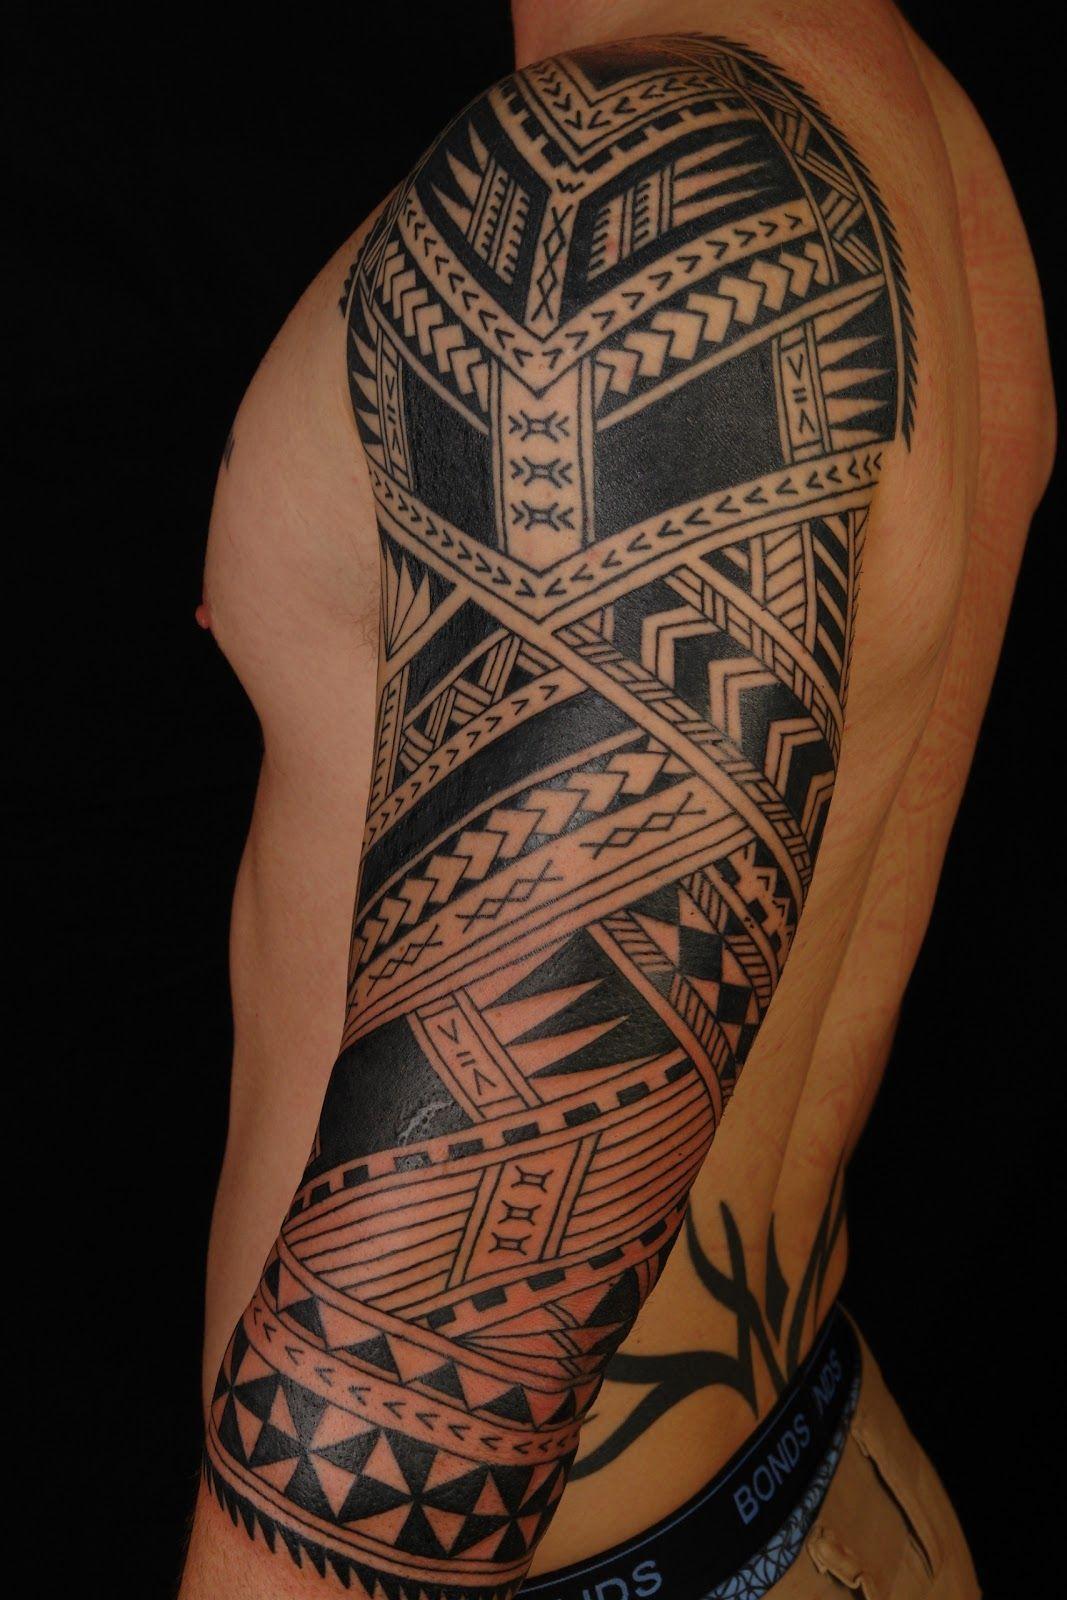 Shane Tattoos Polynesian 3 4 Sleeve Polynesian Tattoo Designs Tattoos Shane Tattoo